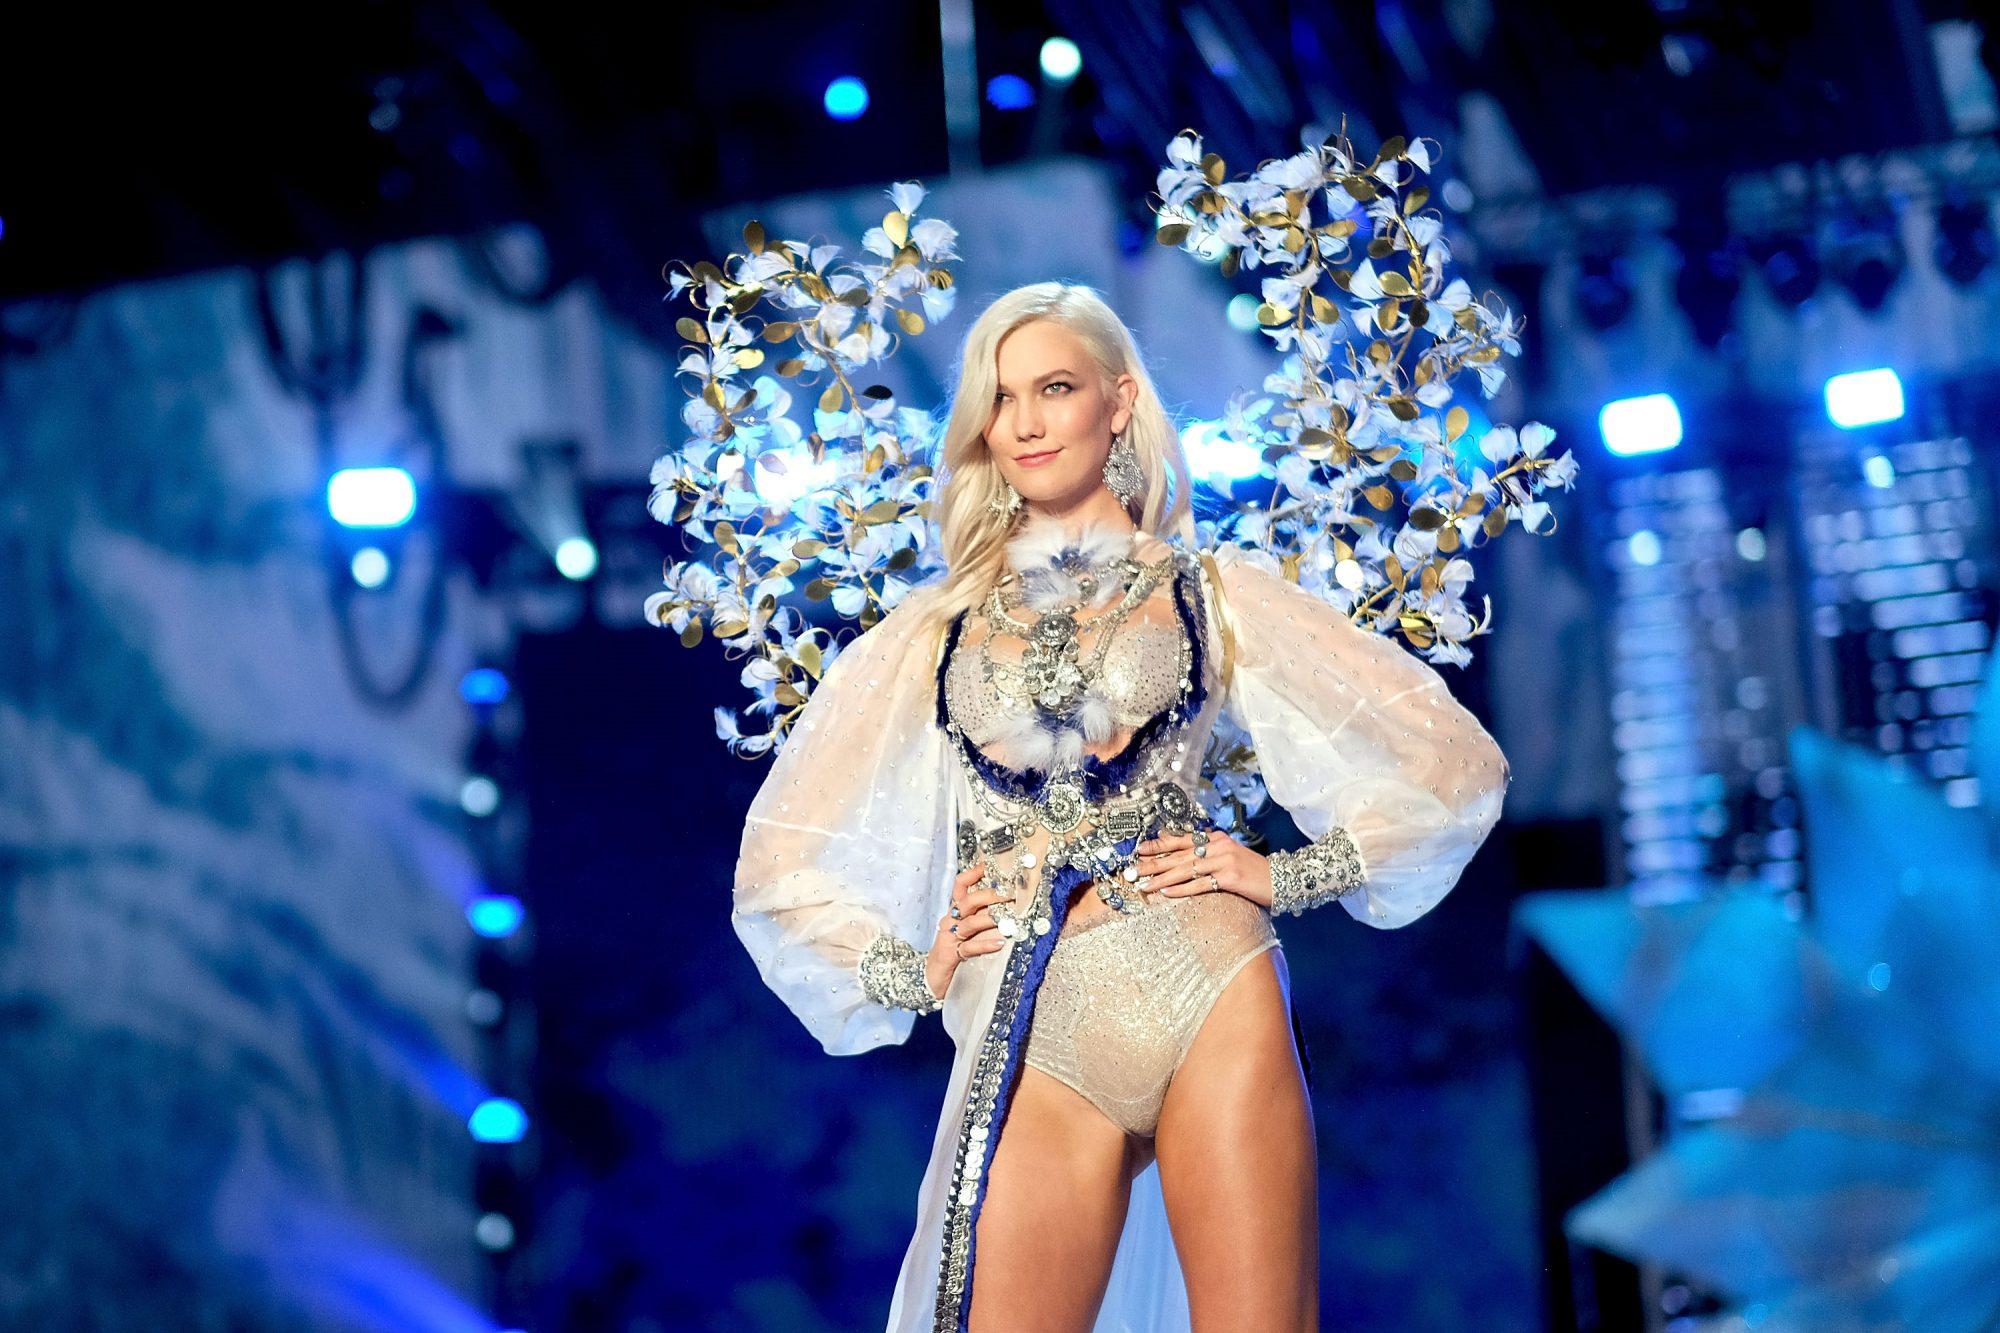 karlie kloss at the victoria's secret fashion show